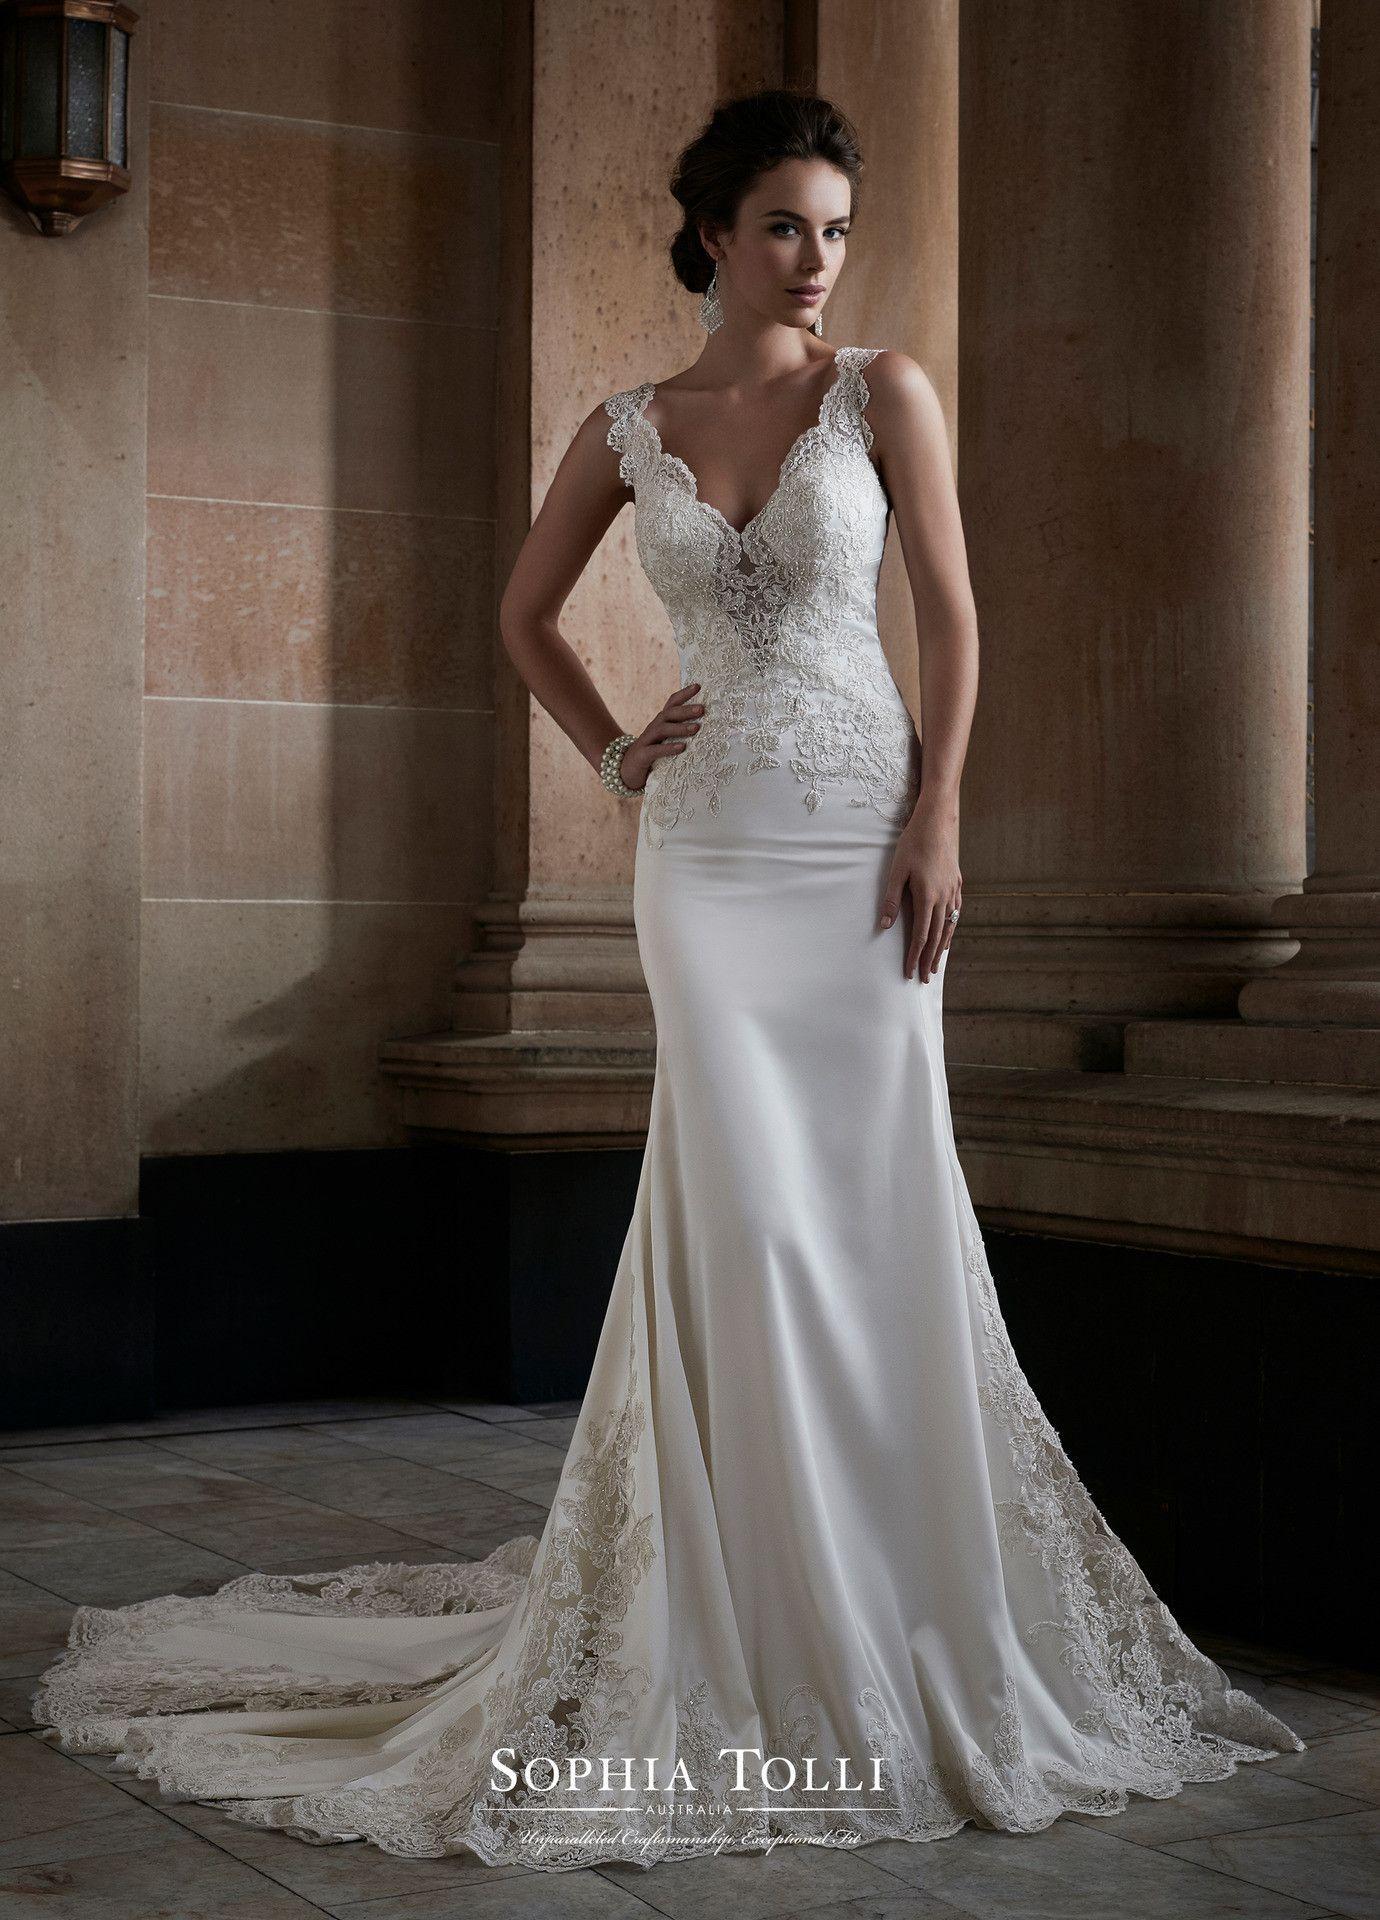 Sophia Tolli - Y21749 - Adhara - All Dressed Up, Bridal Gown ...